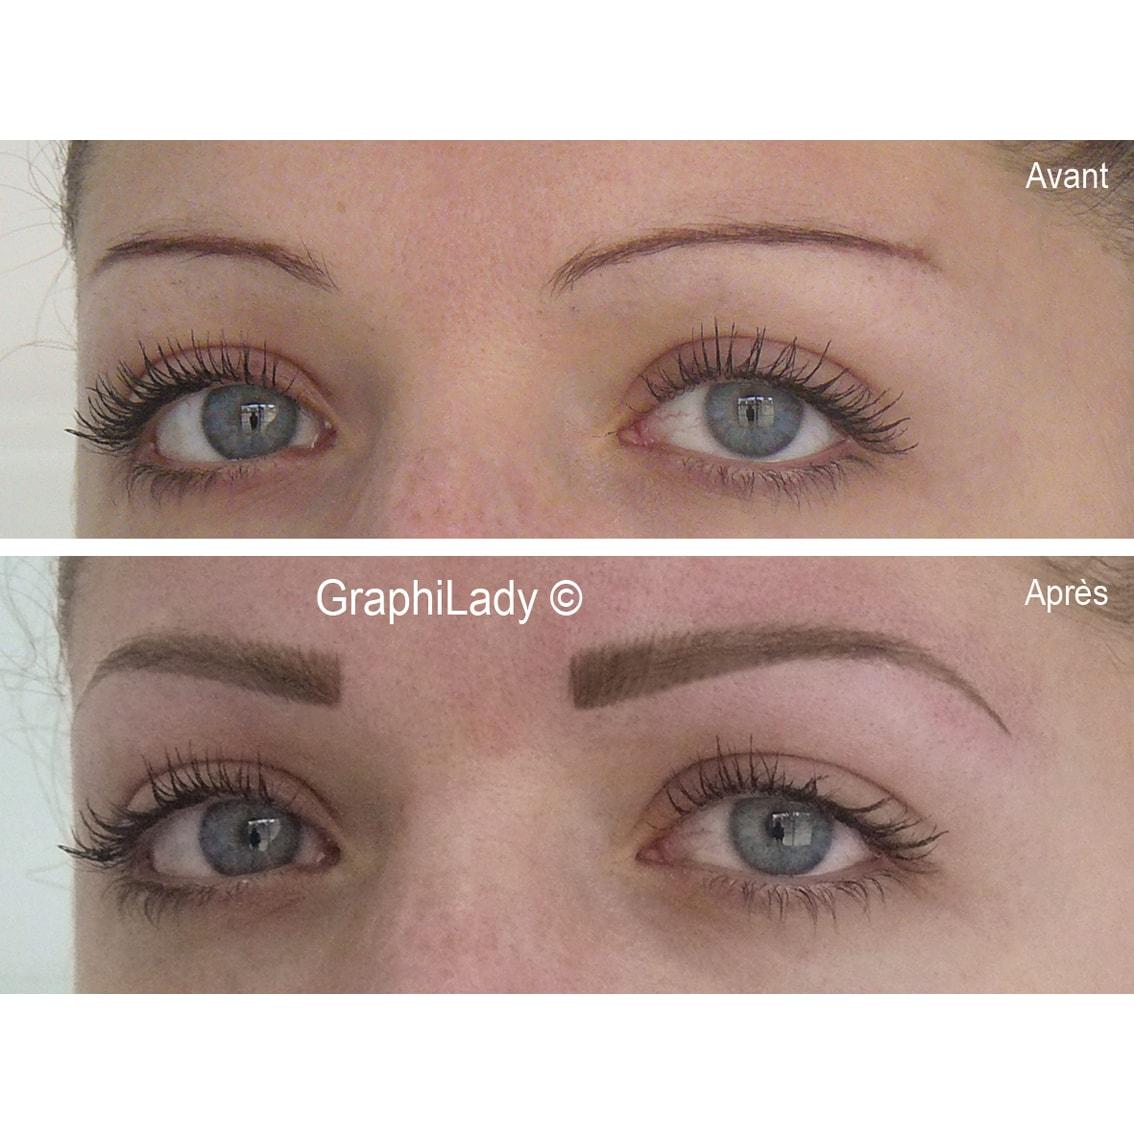 maquillage permanent sourcils 16 graphilady